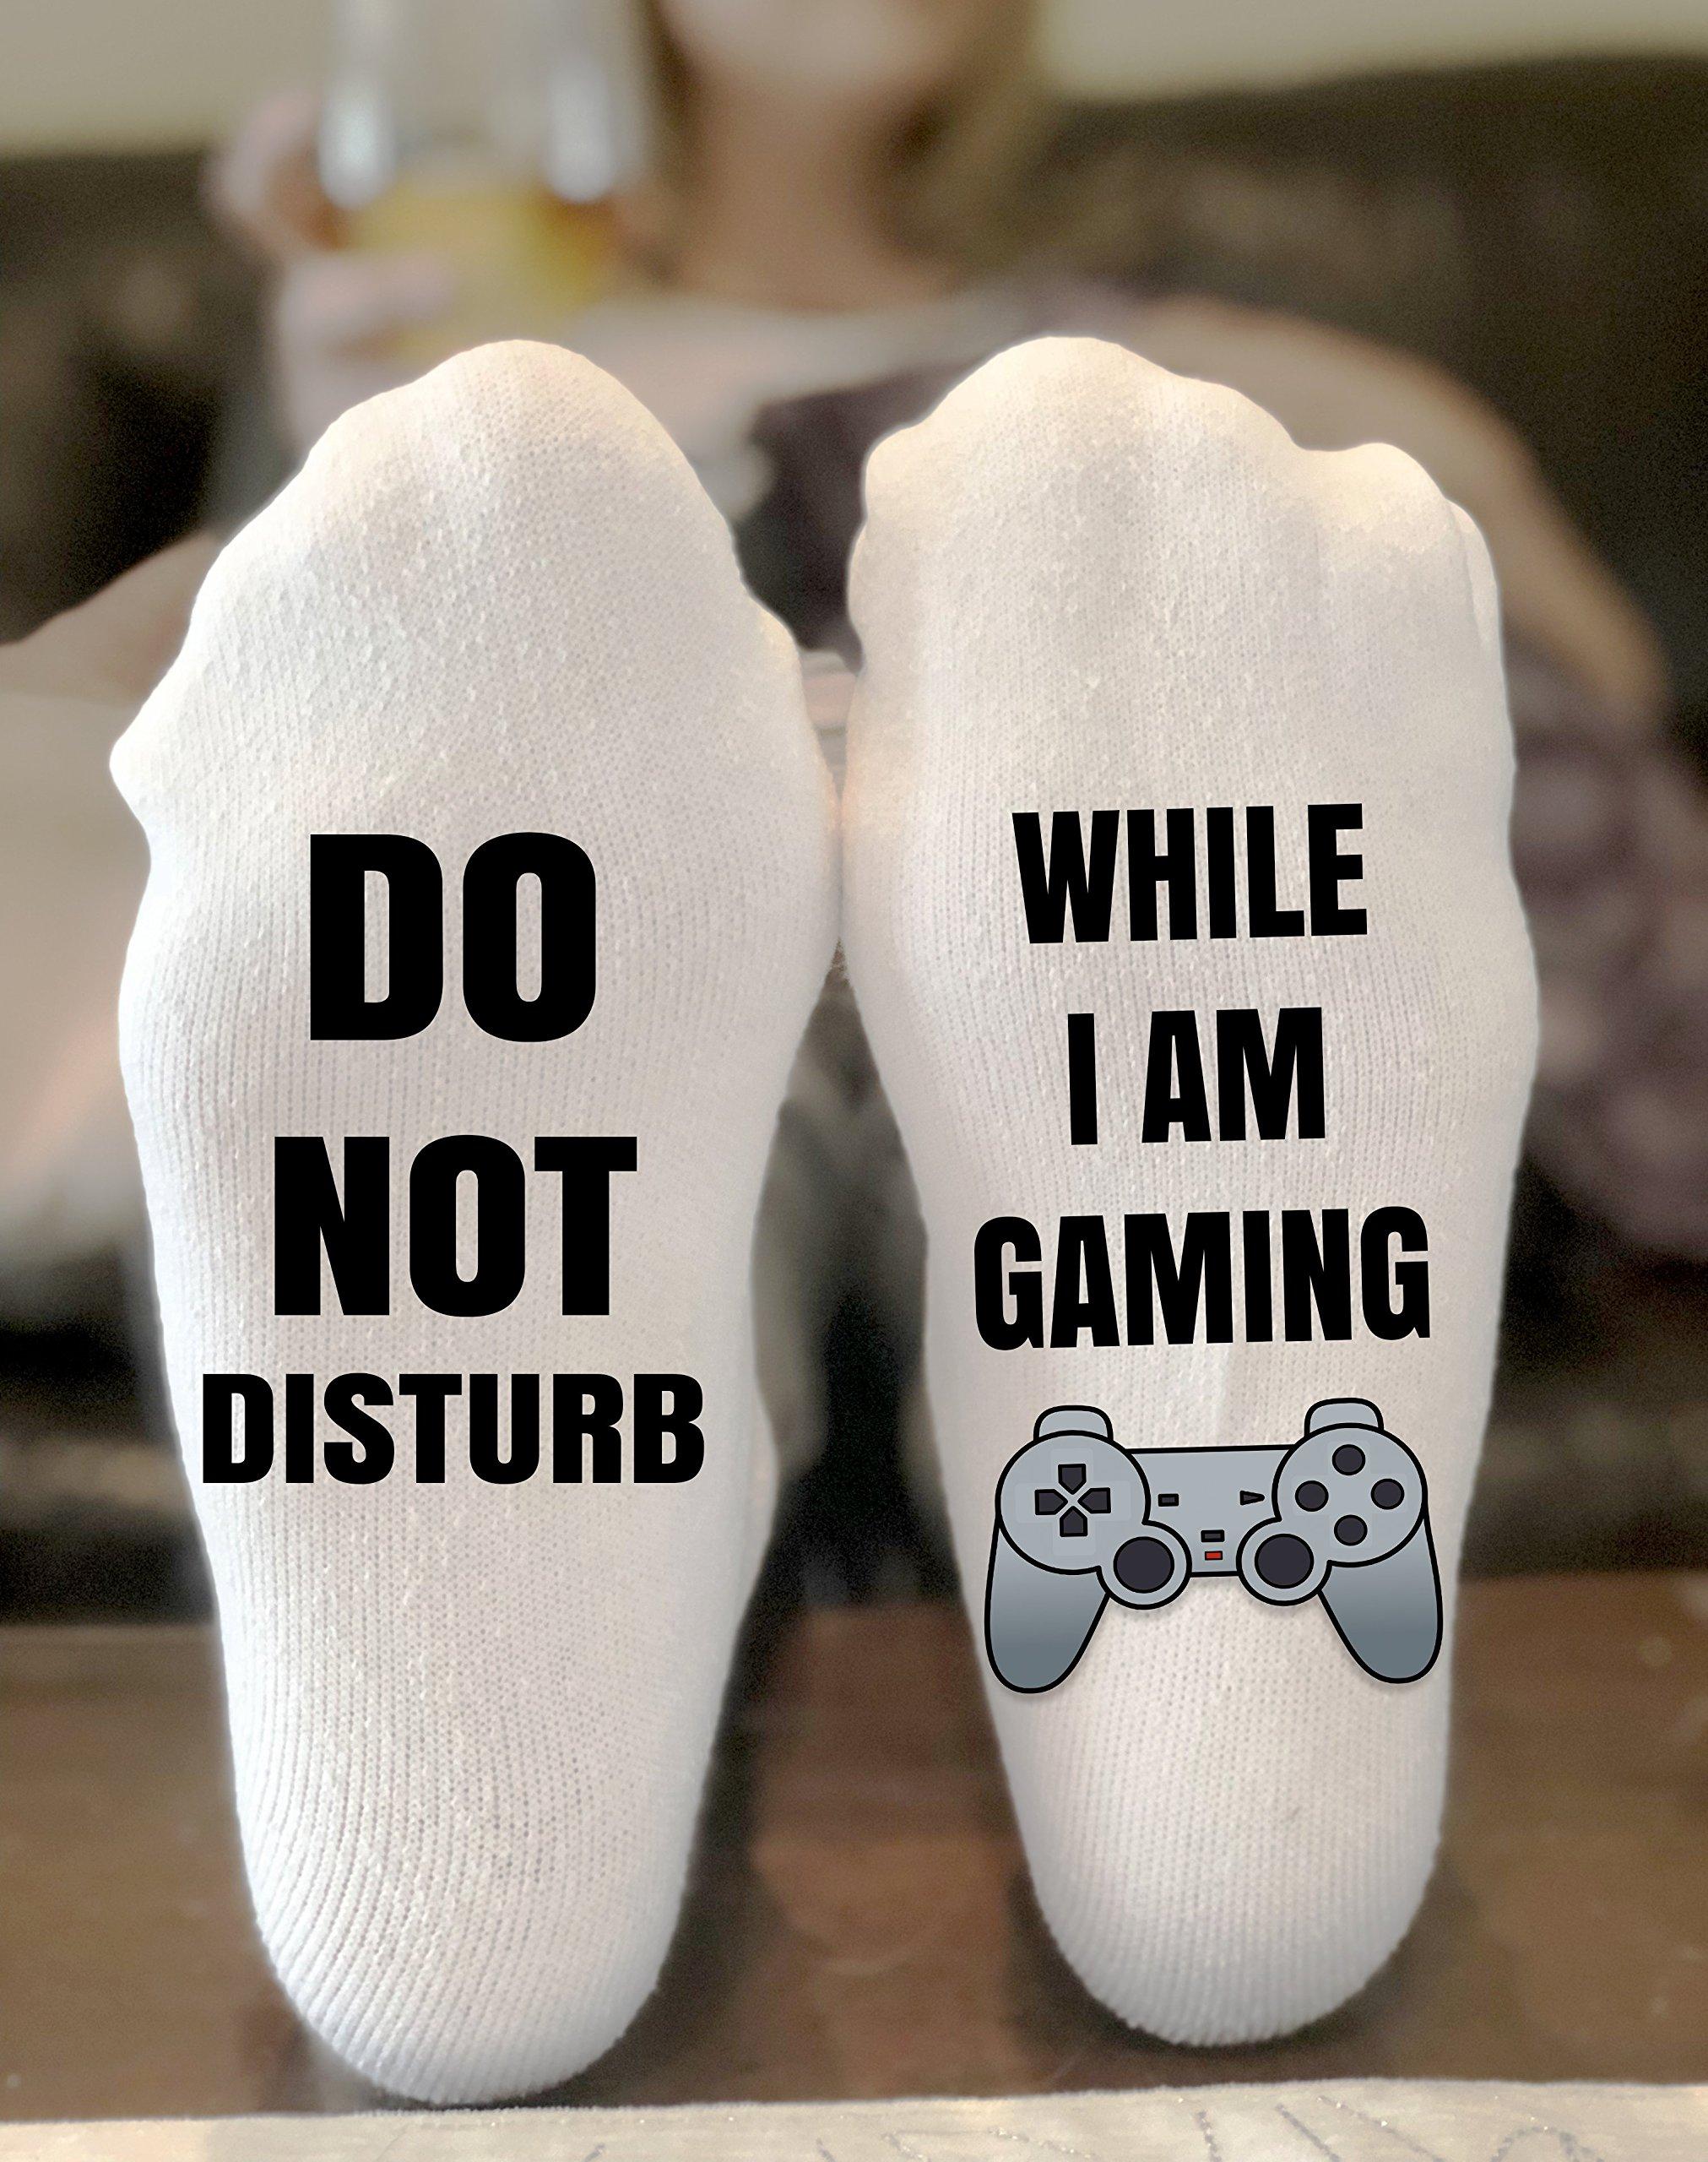 Do Not Disturb While I Am Gaming Novelty Funky Crew Socks Men Women Christmas Gifts Cotton Slipper Socks